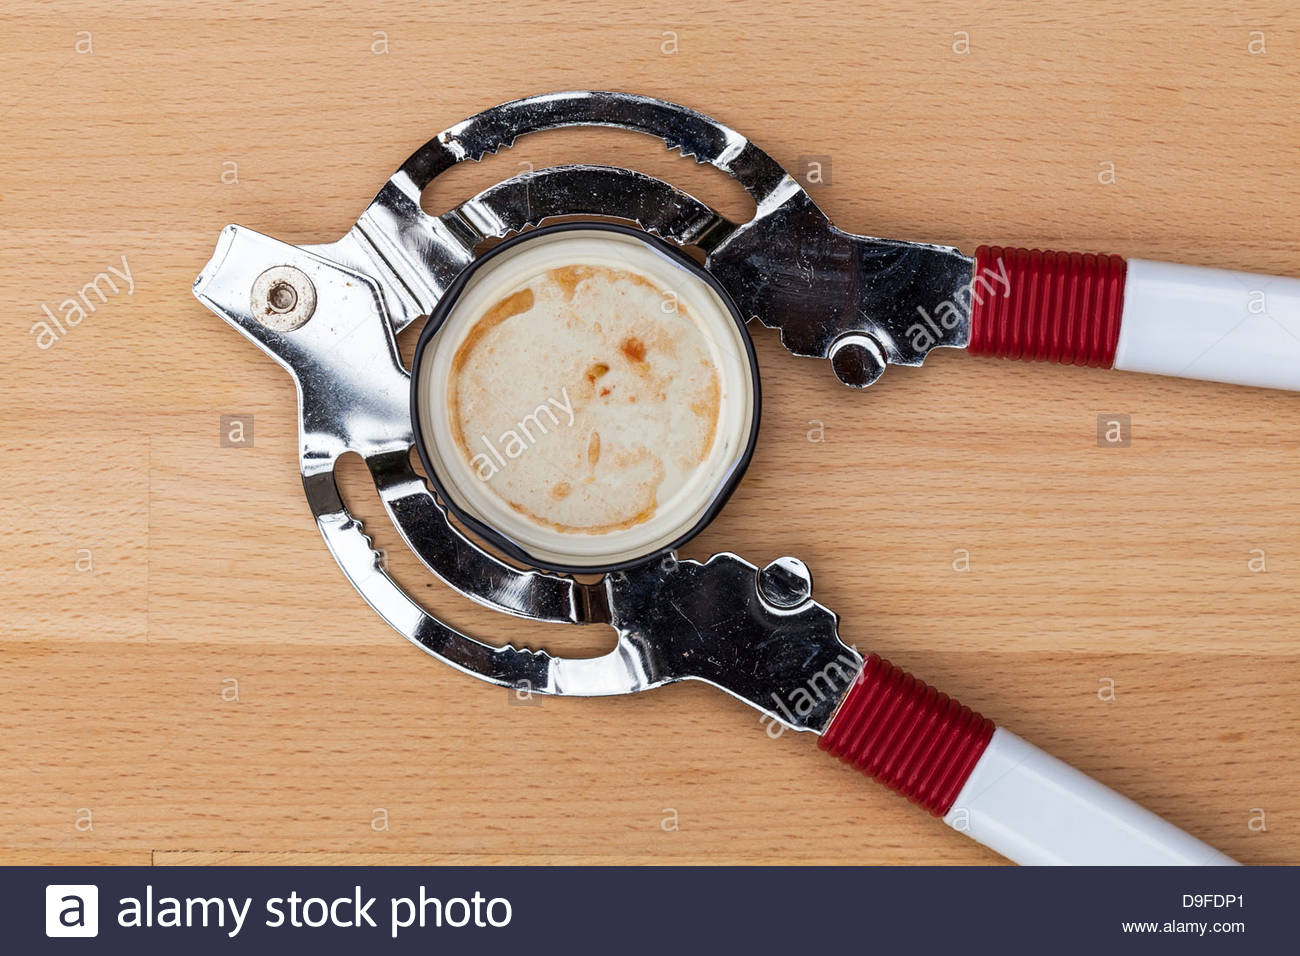 Jar or lid opener - kitchen gadget for opening food jars - Stock Image